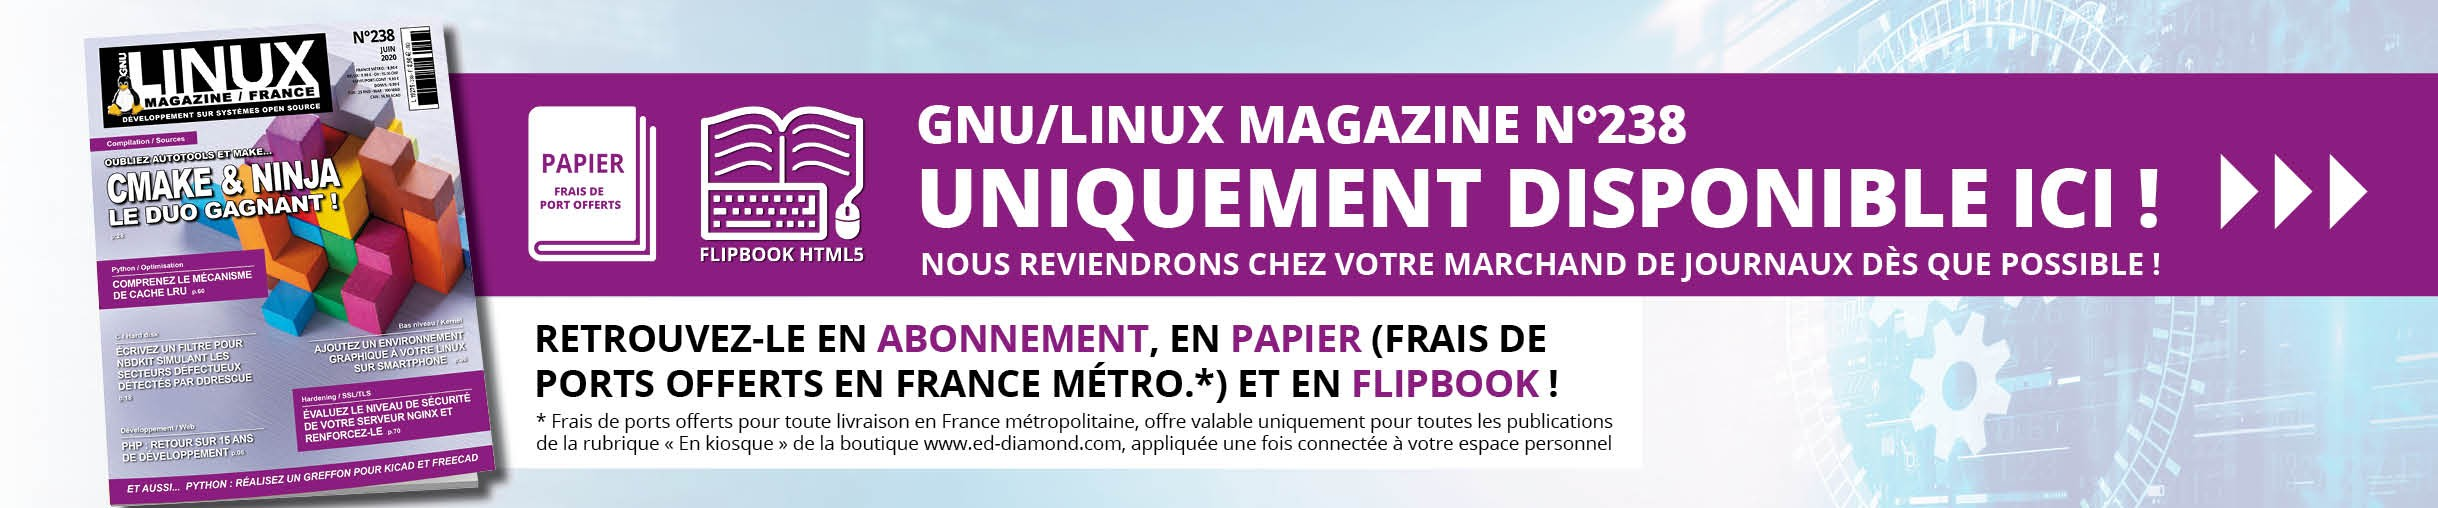 GNU/Linux Magazine n°238